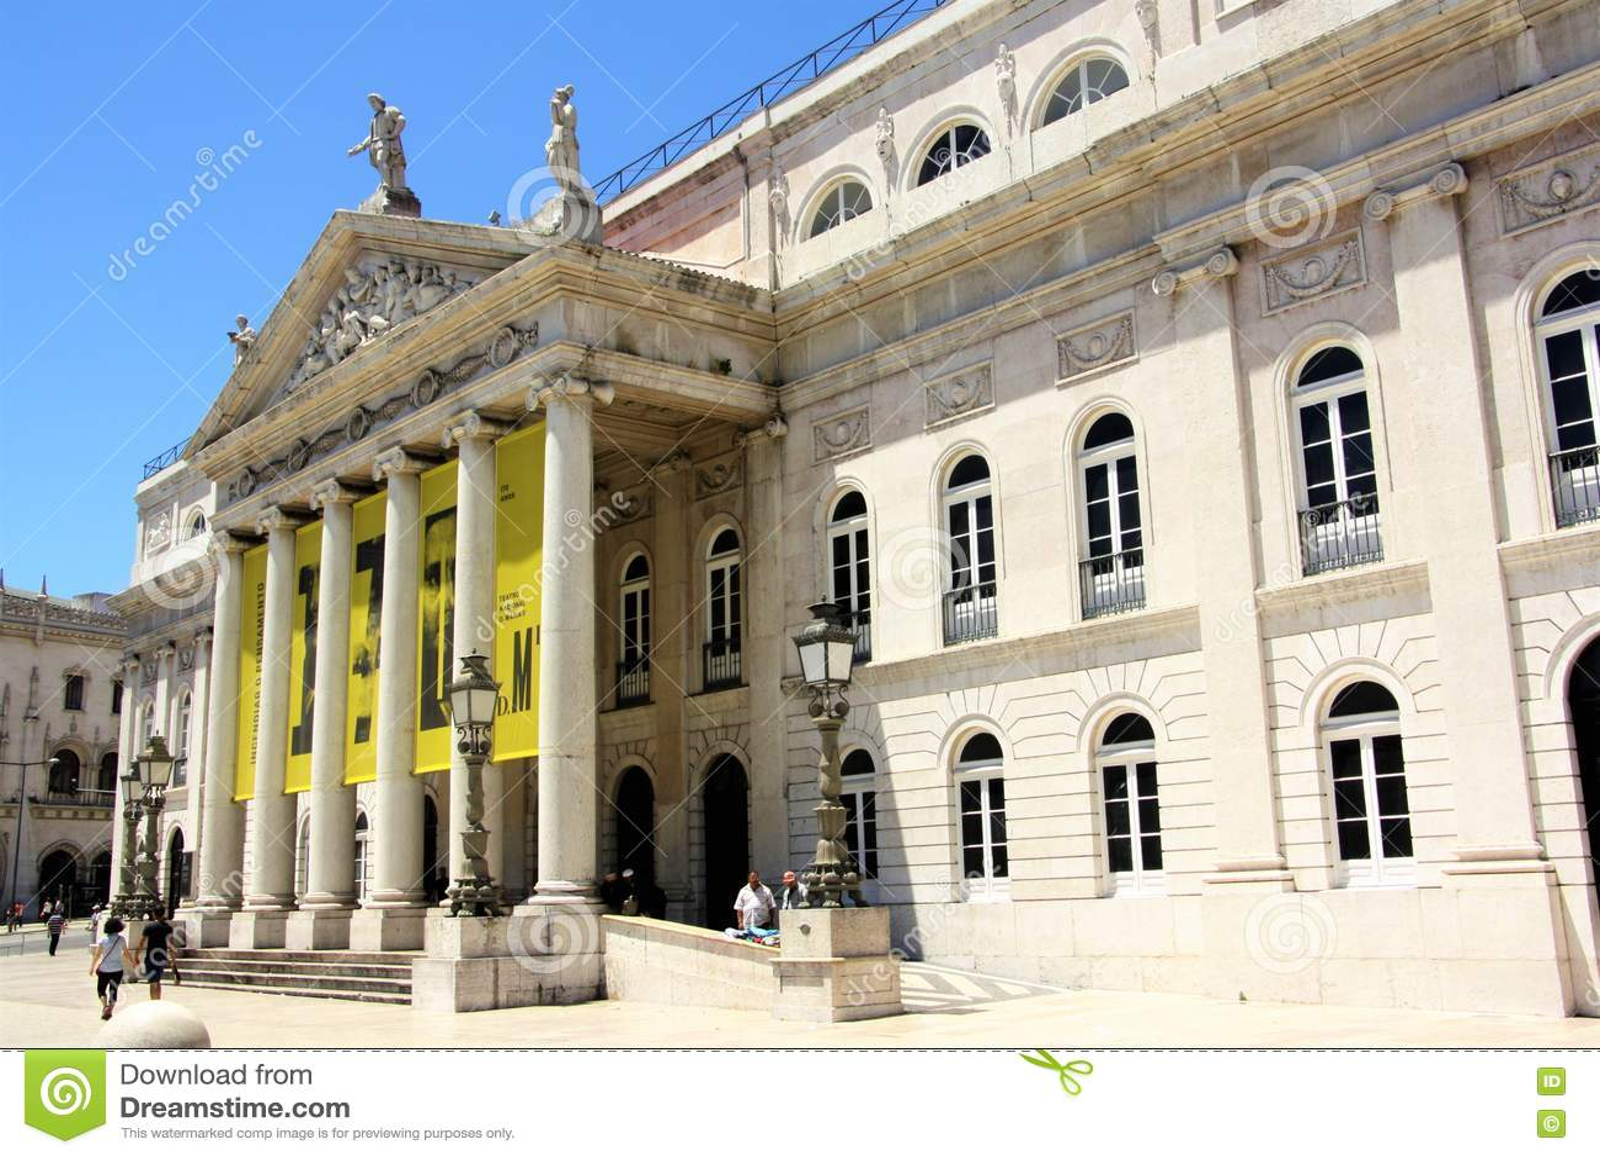 D. Maria II National Theatre in Lisbon, Portugal